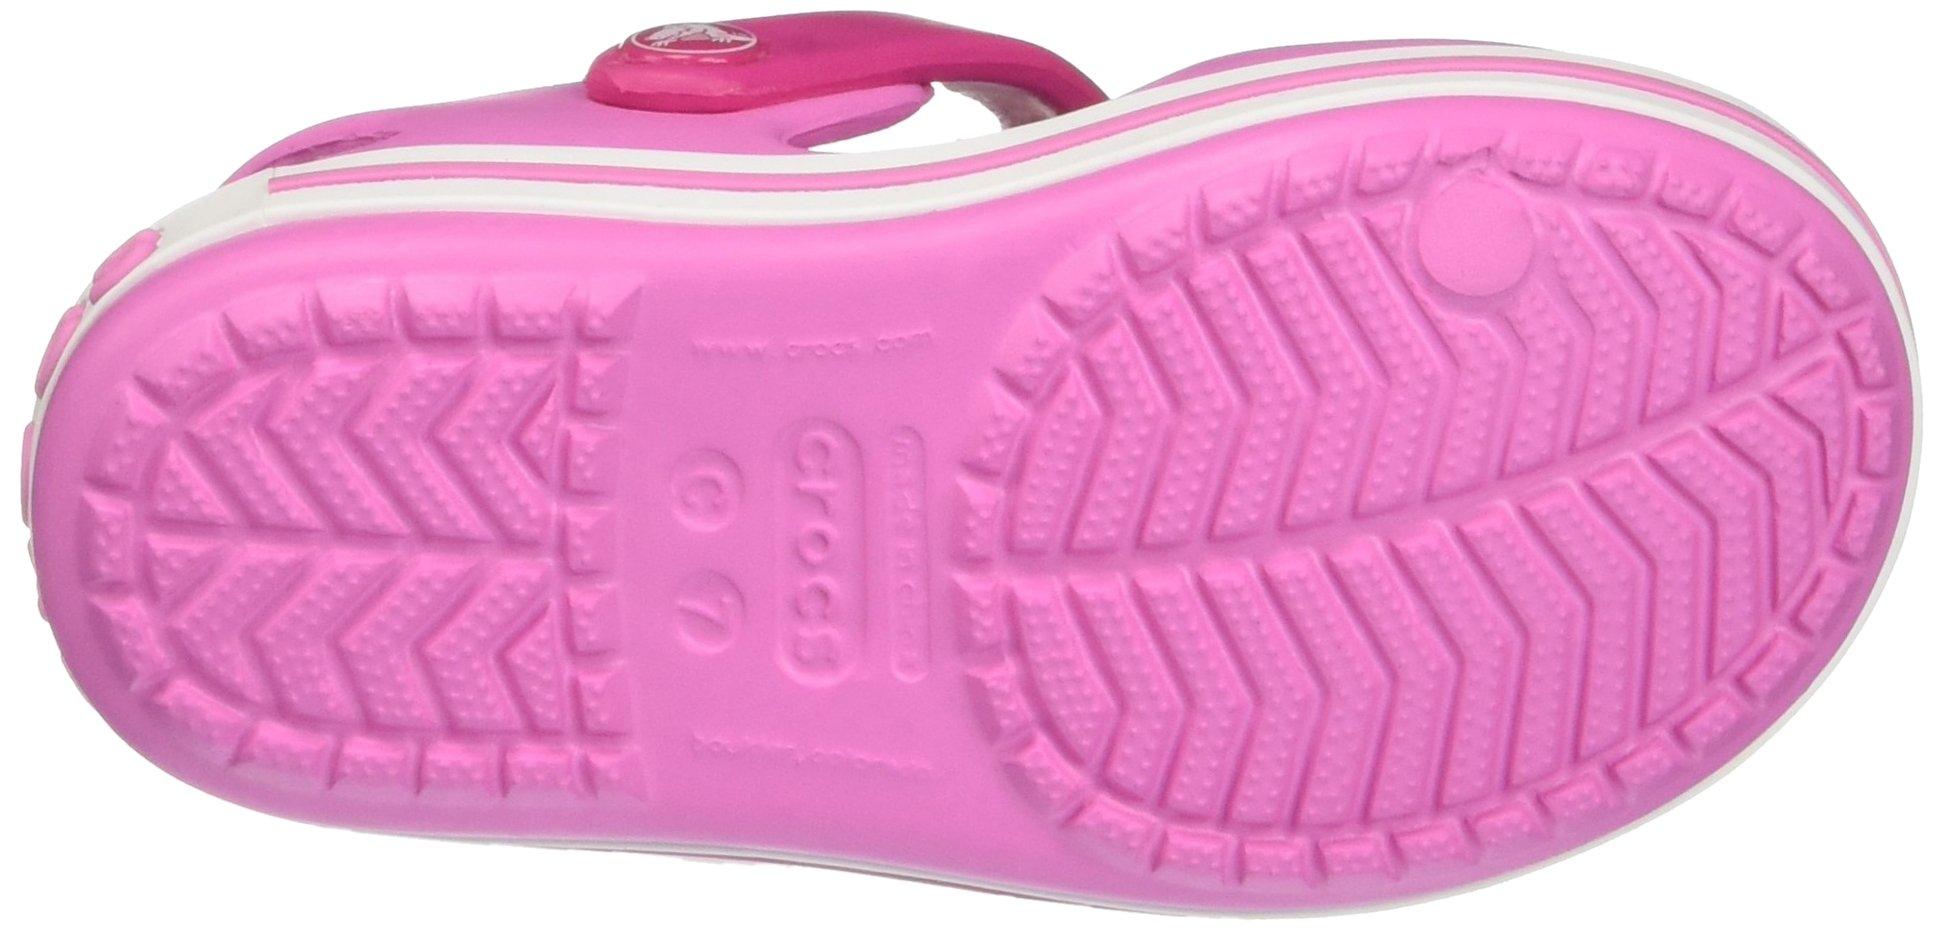 Crocs Crocband  Fun Lab   Light-Up Clog, Pink, C6 M US Toddler by Crocs (Image #3)